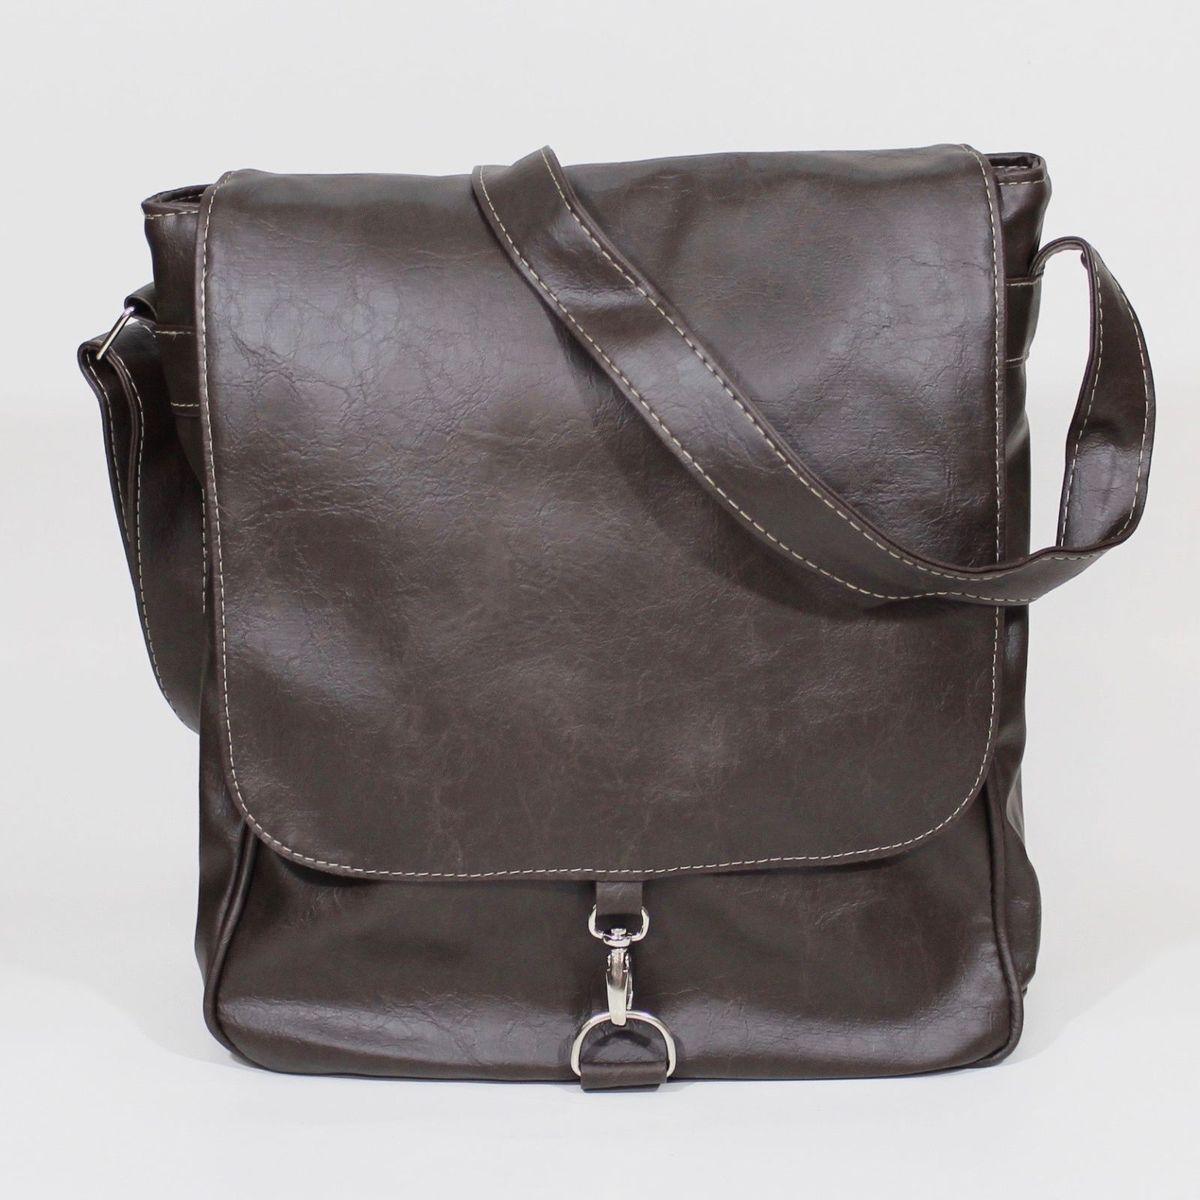 bolsa masculina fellow - bolsas manbag